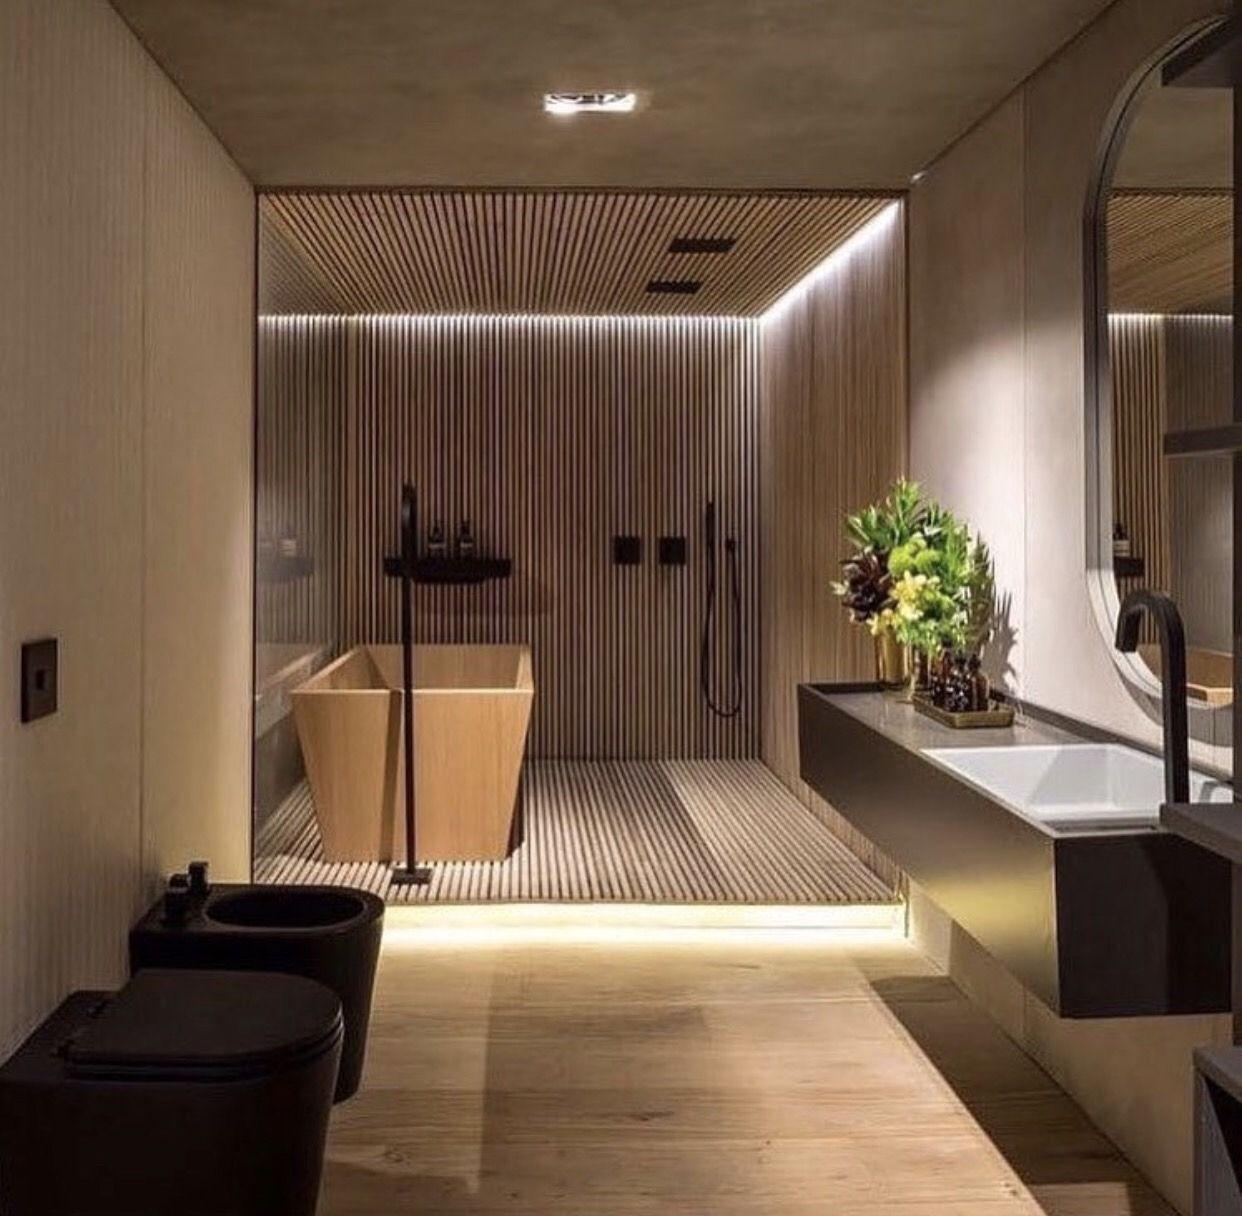 Cheap Bathroom Decor Saleprice 47 Di 2020 Ide Kamar Mandi